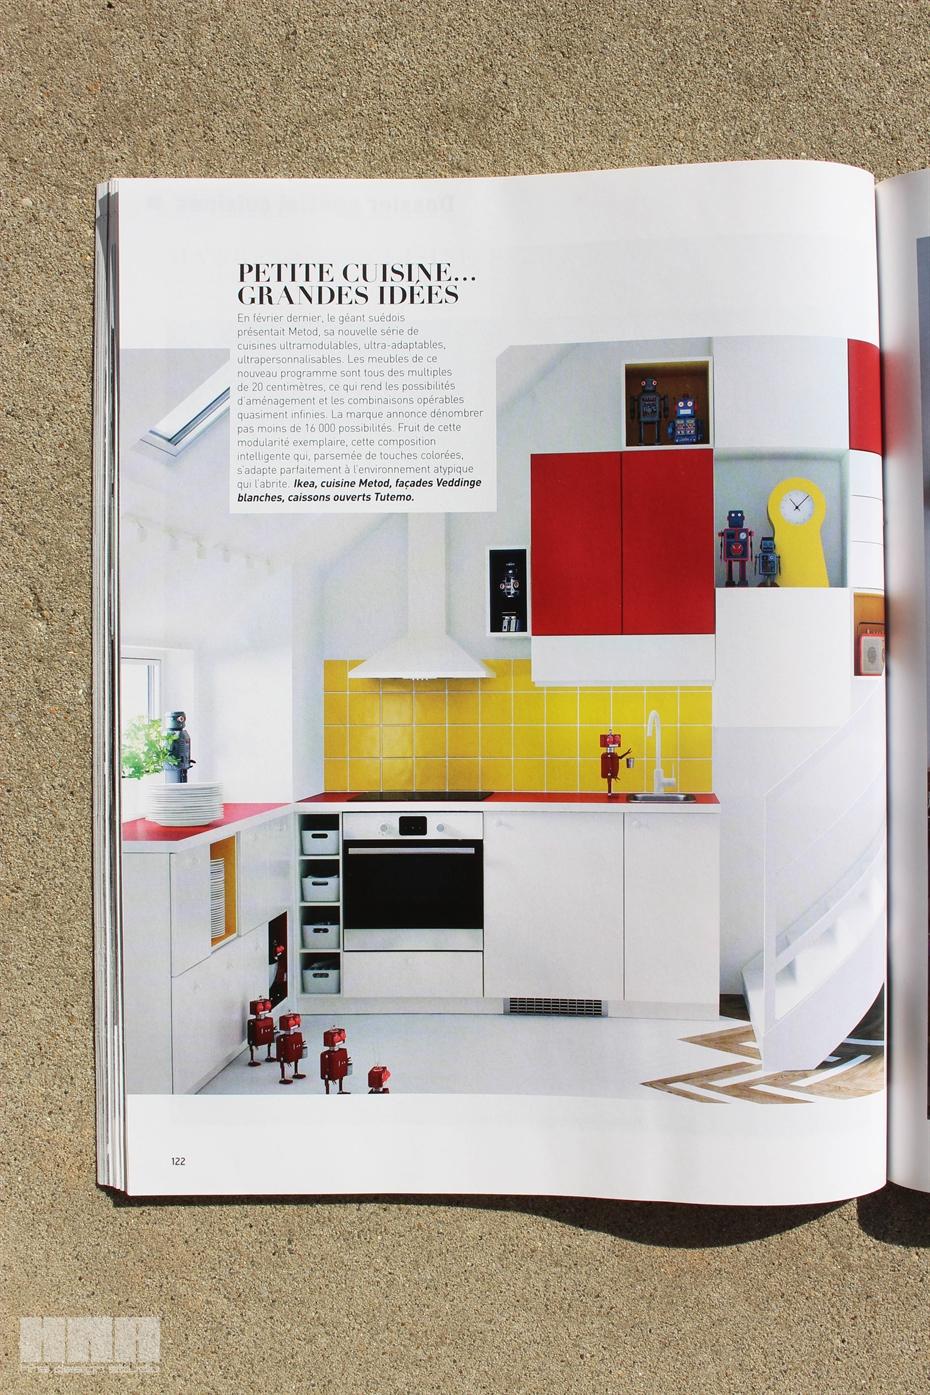 hna design cuisines and bains 2014 november december 17